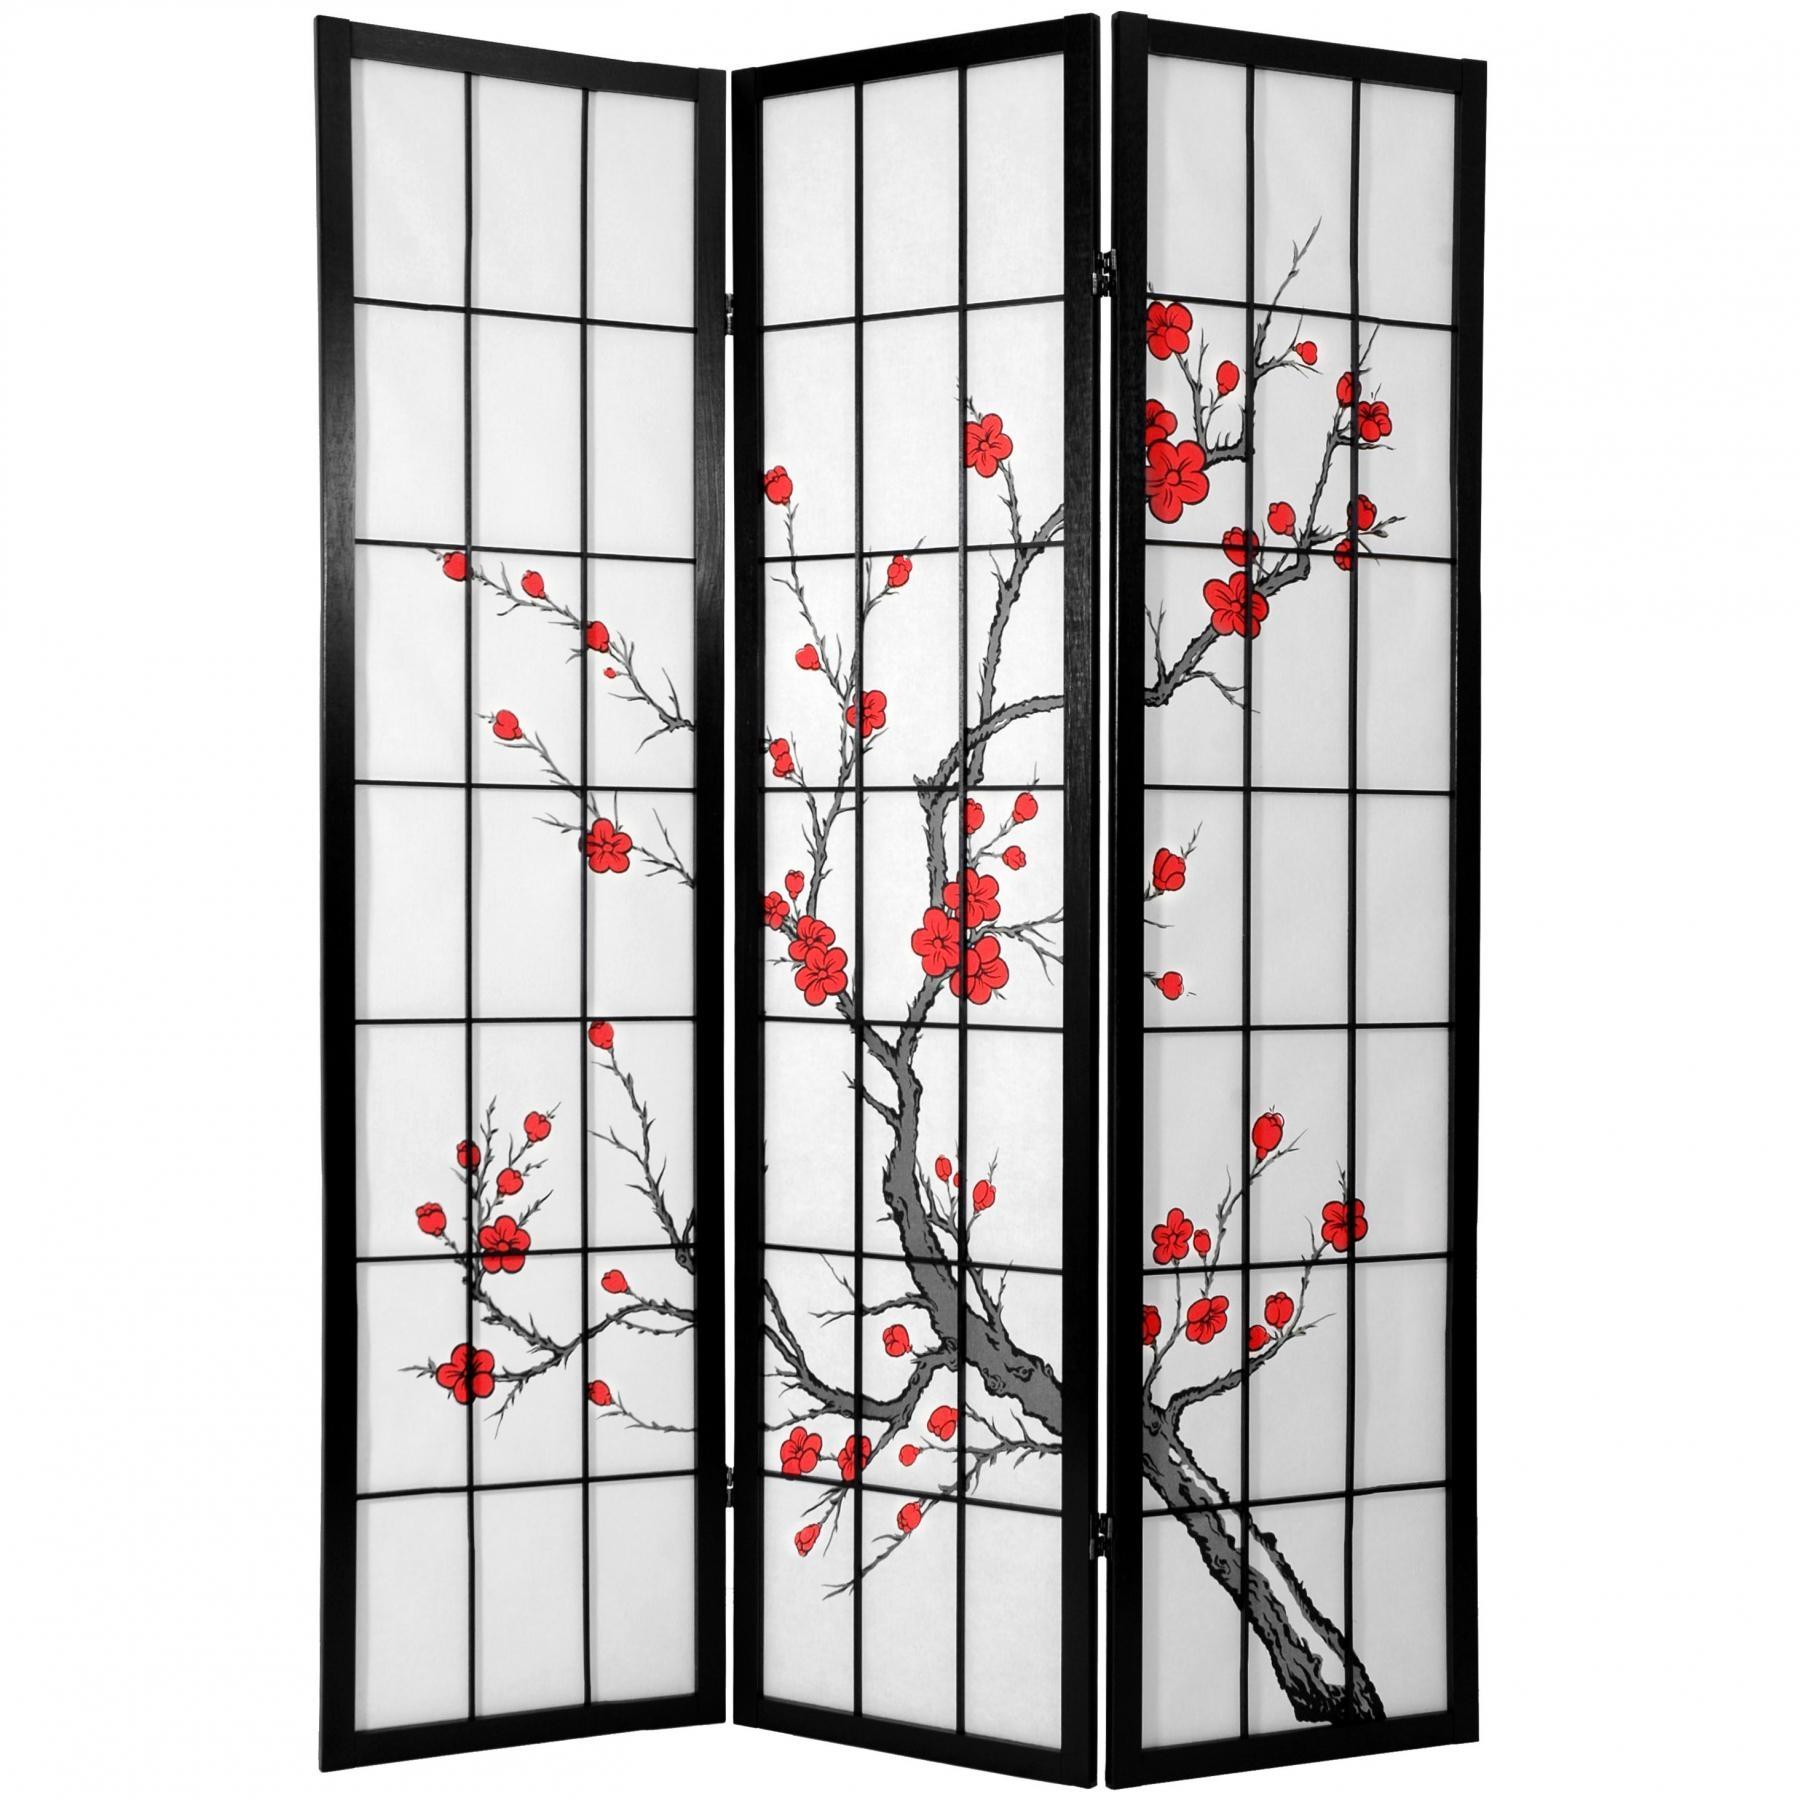 Cherry Blossom Shoji Sliding Door Kit6 ft tall cherry blossom shoji screen roomdividers